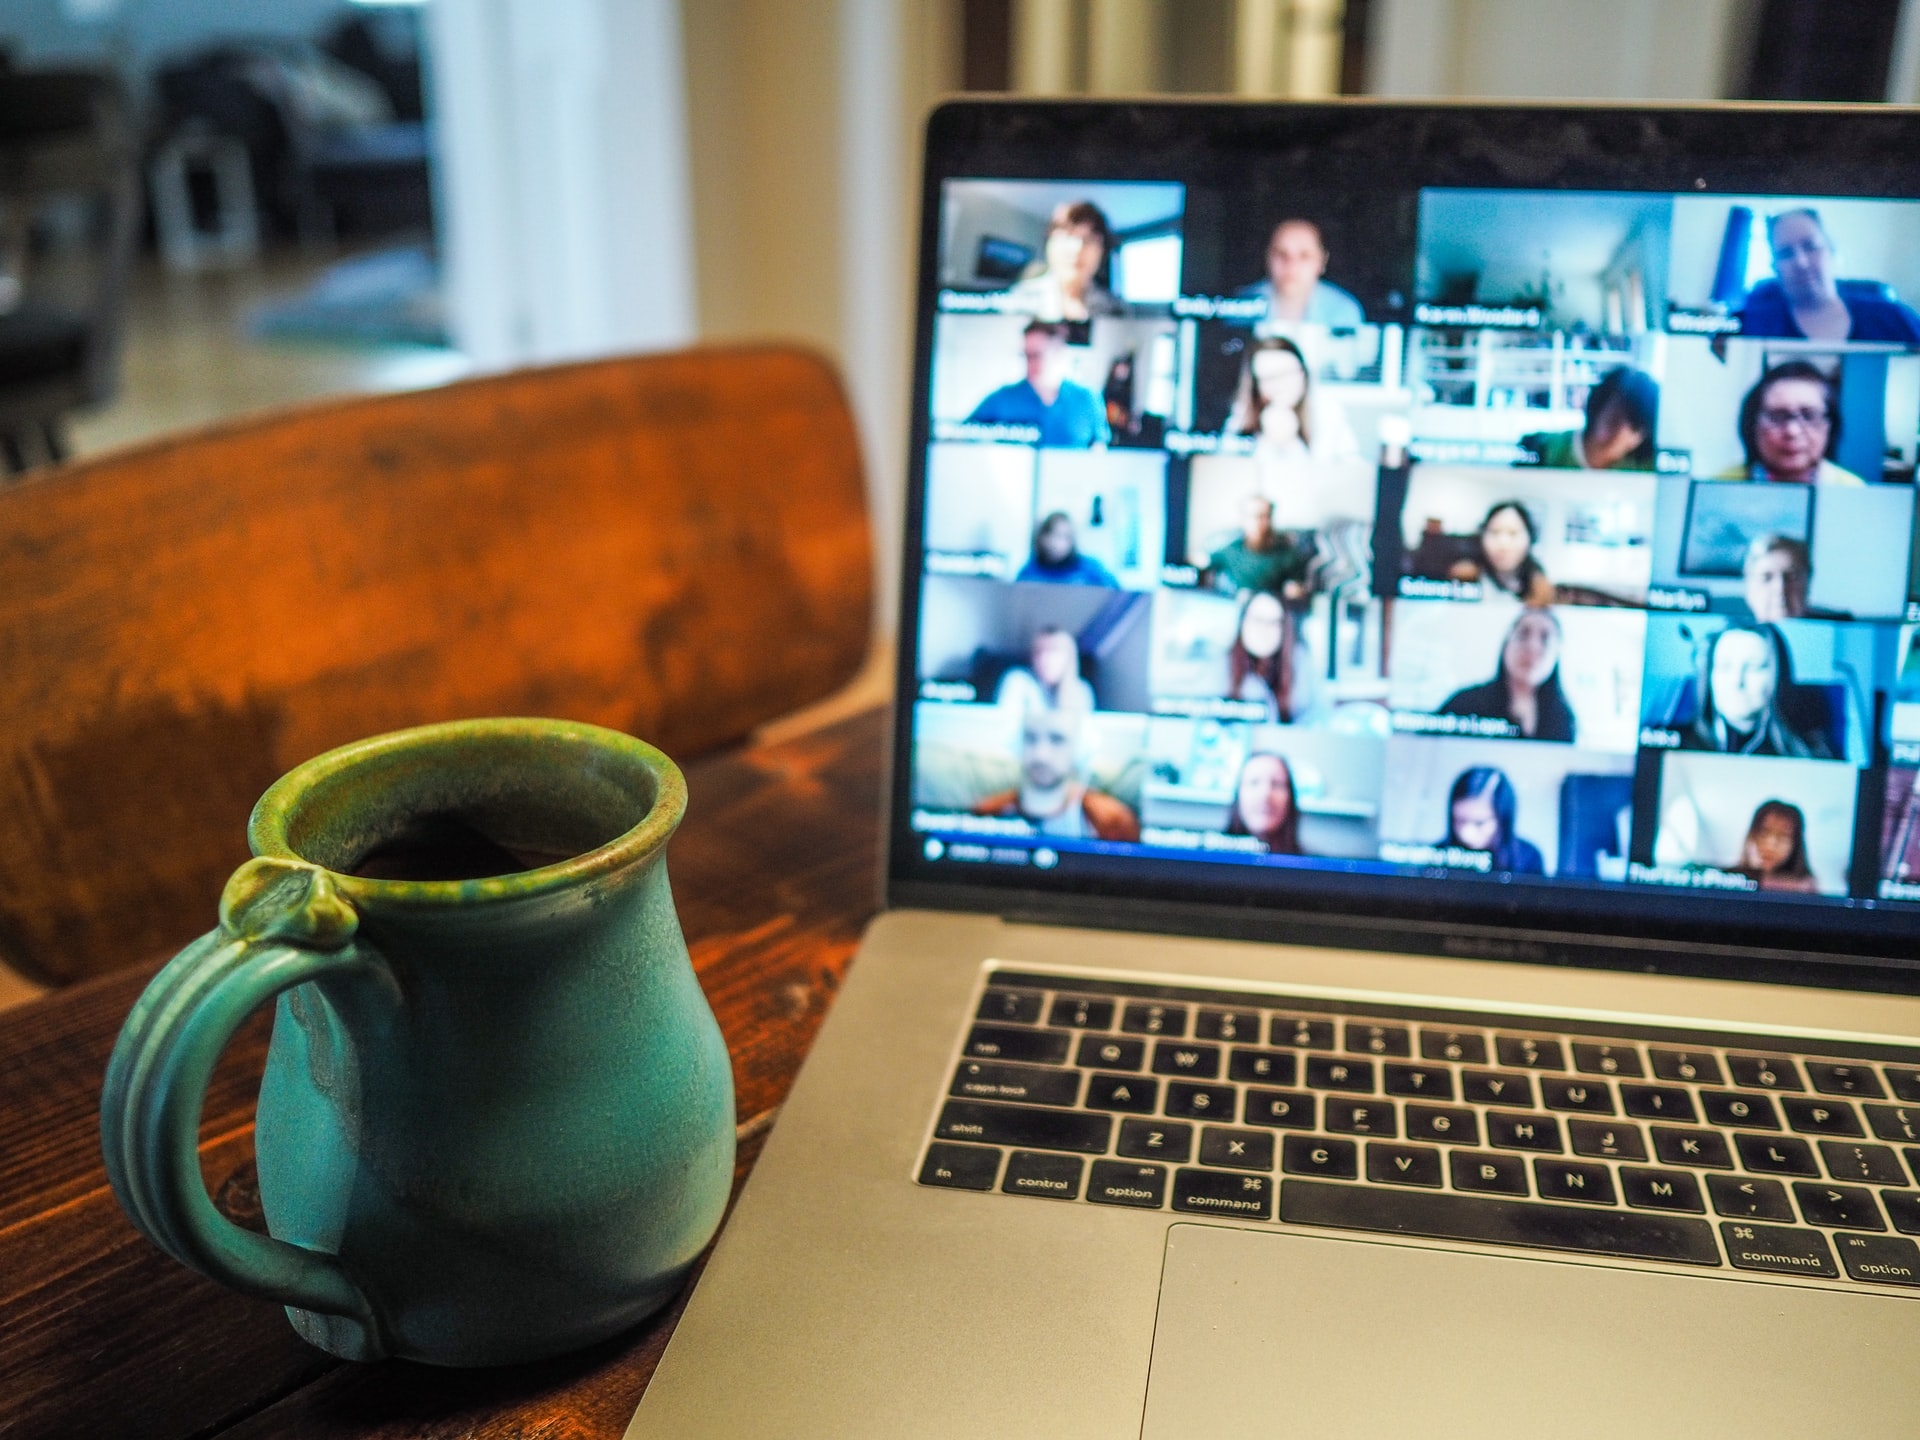 Pentingnya Memilih Event Organizer Handal untuk Melakukan Webinar